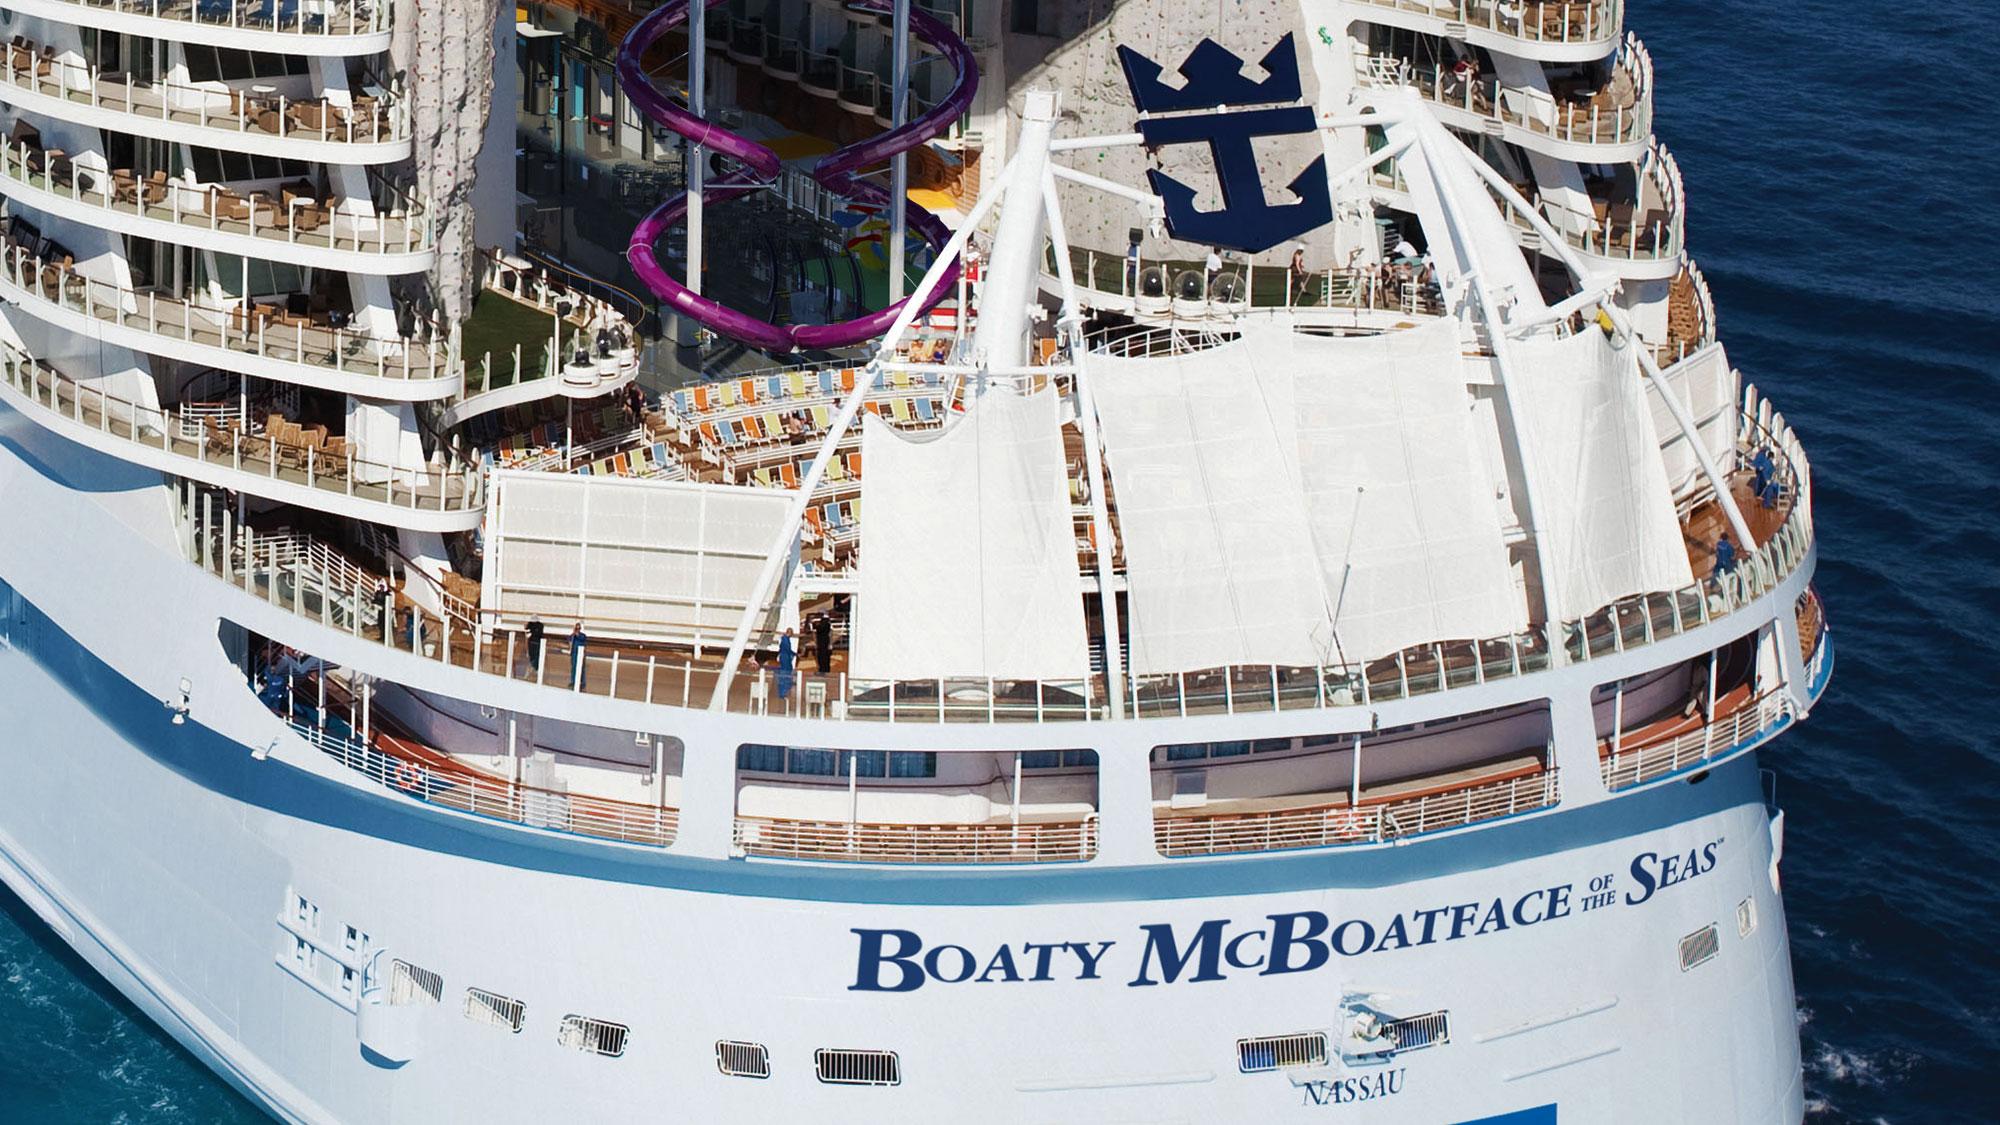 Royal Caribbean seeks name advice from 'Boaty McBoatface' creator